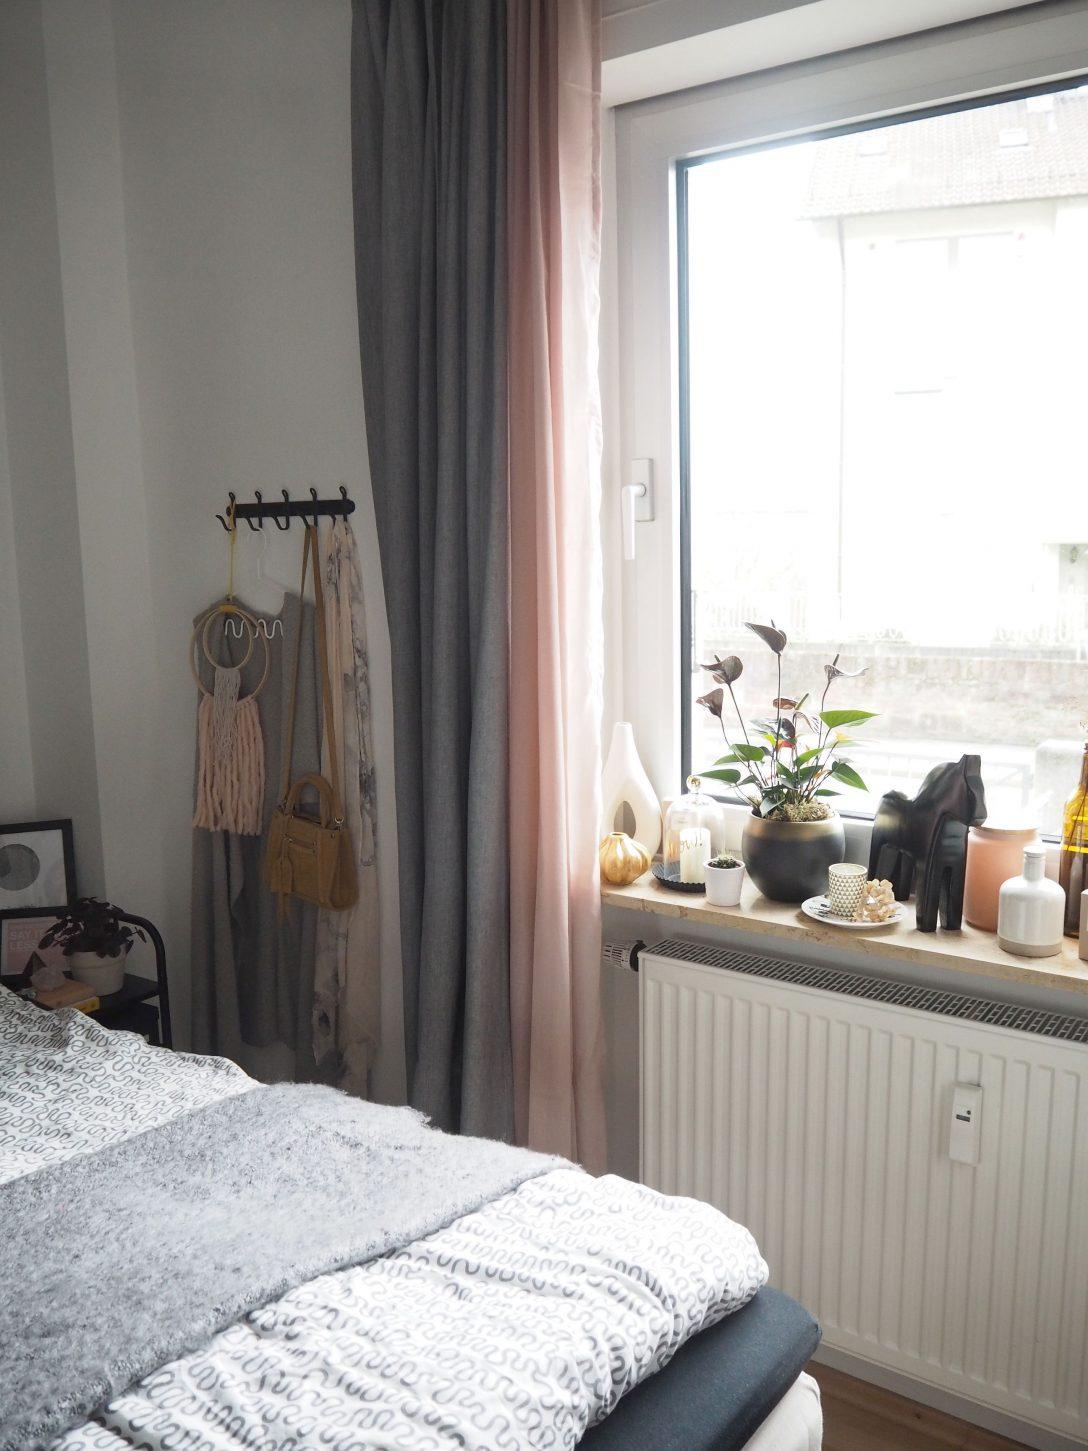 Large Size of Fensterbank Dekorieren Wohnzimmer Fensterbank Dekorieren